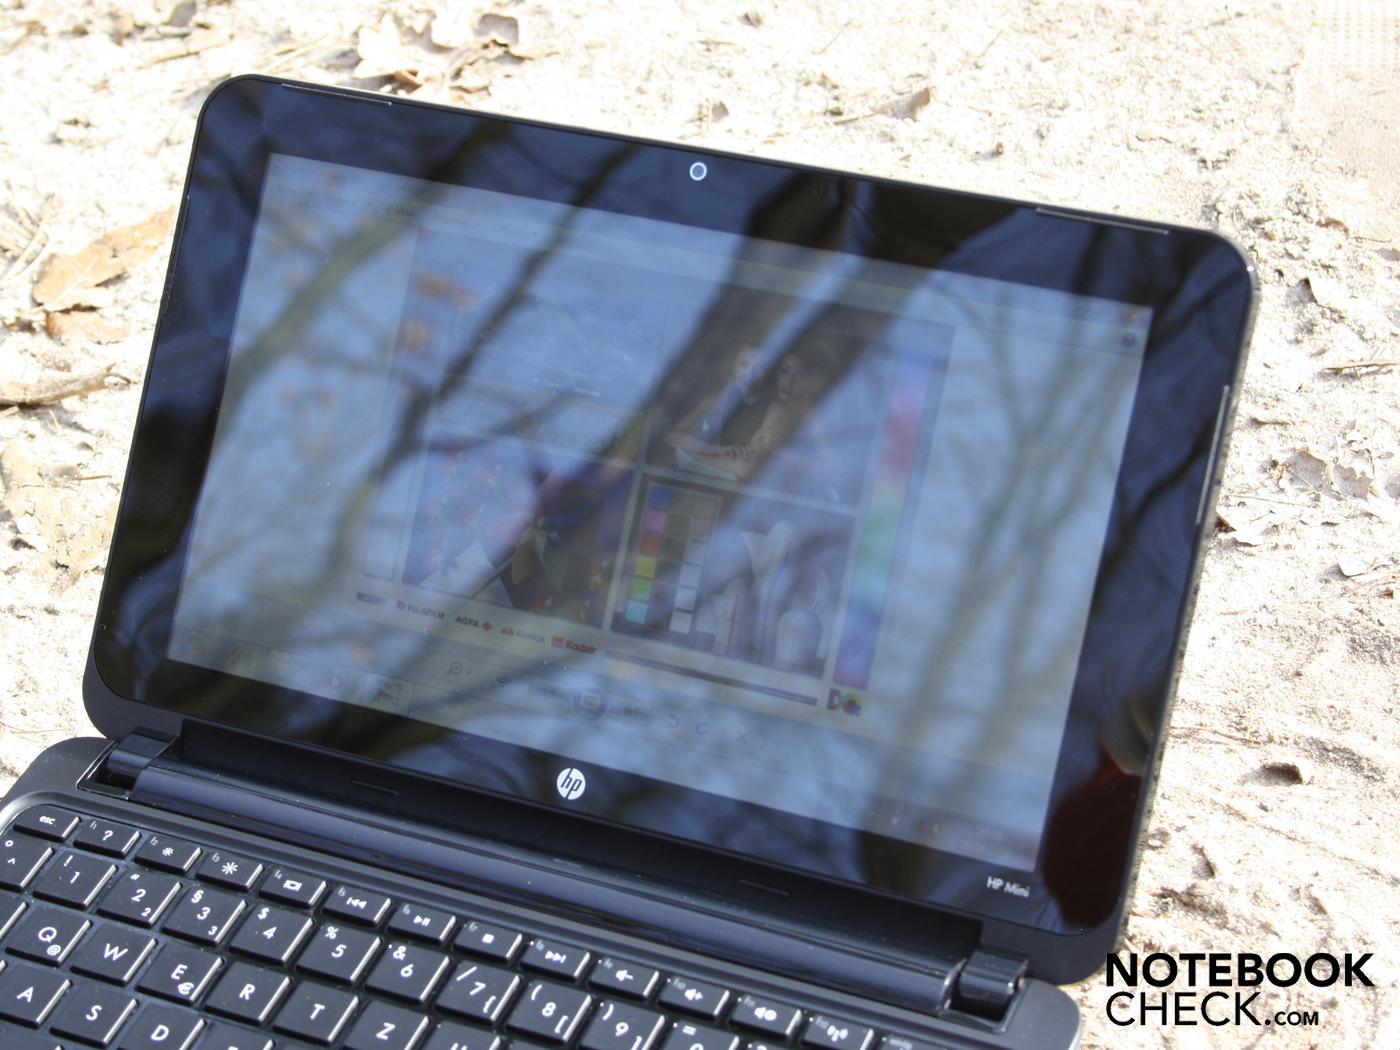 Critique Du Hp Mini 210 1021eg Notebookcheck Fr